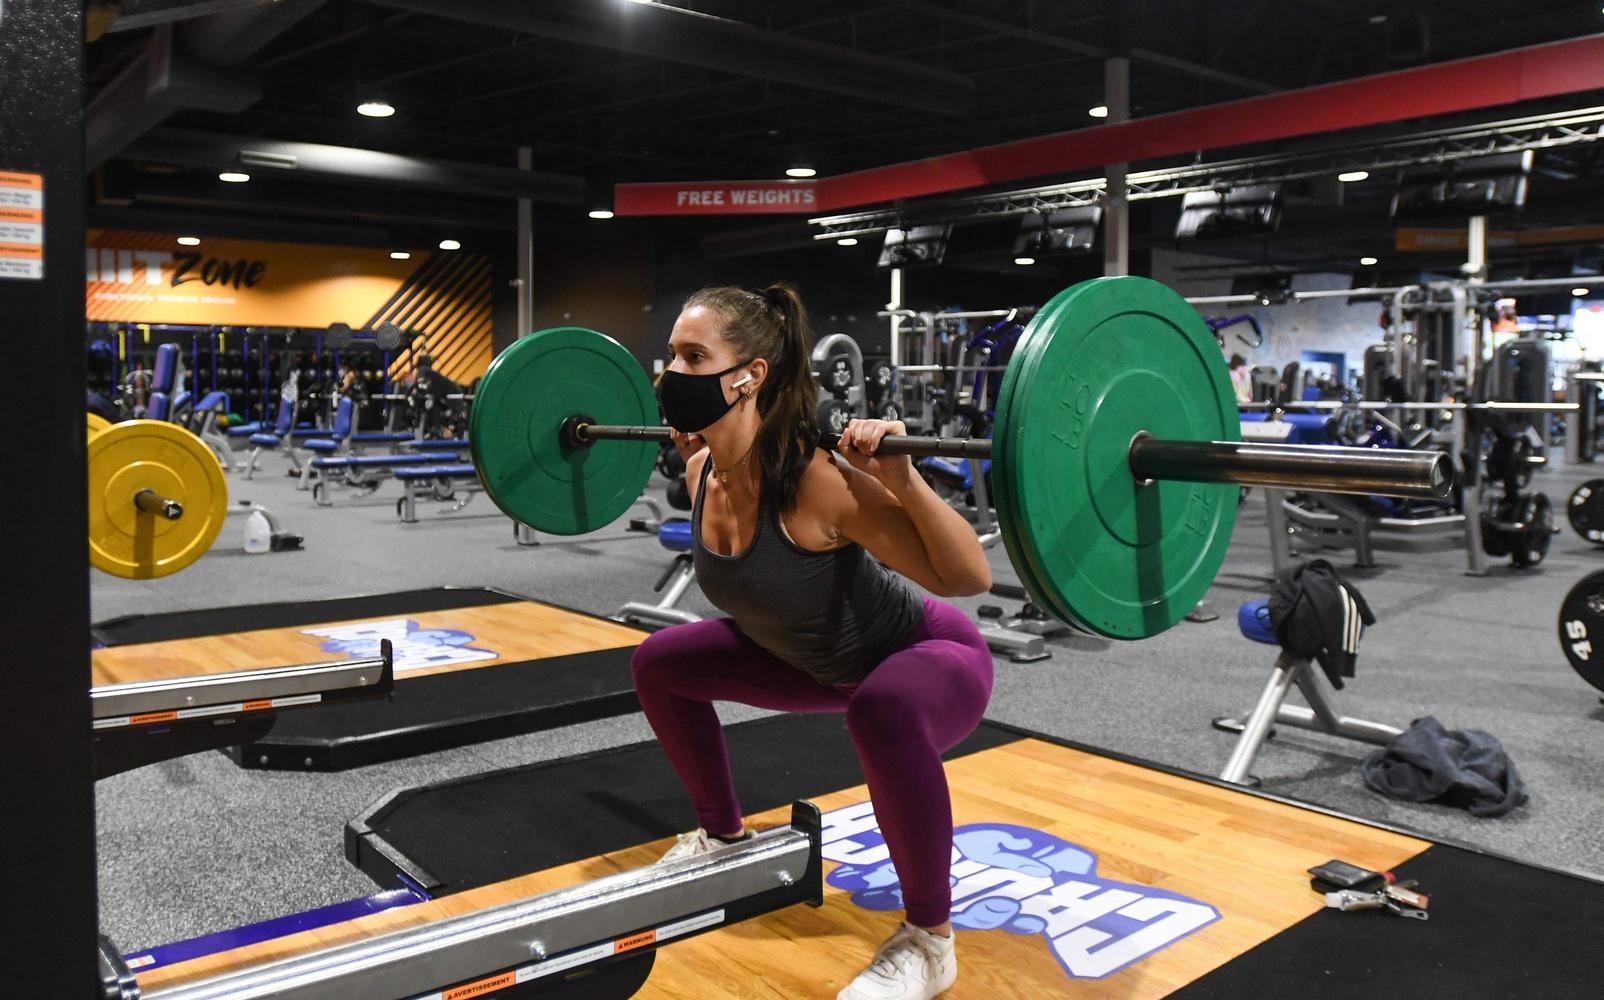 A woman squats at a gym